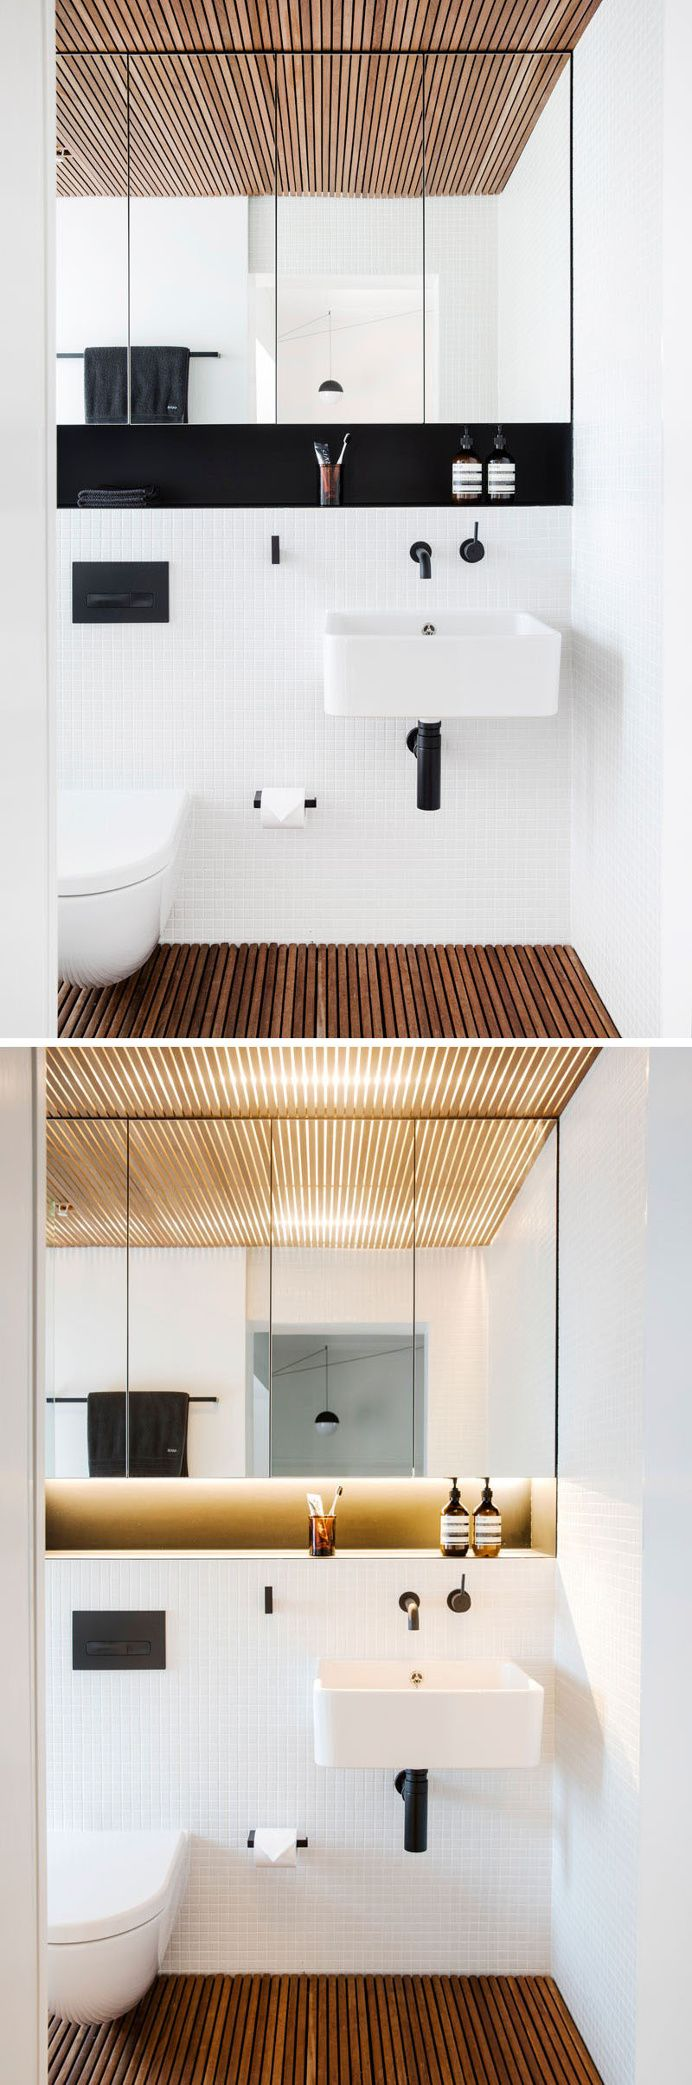 284 best Bathrooms images on Pinterest | Bathroom ideas, Modern ...